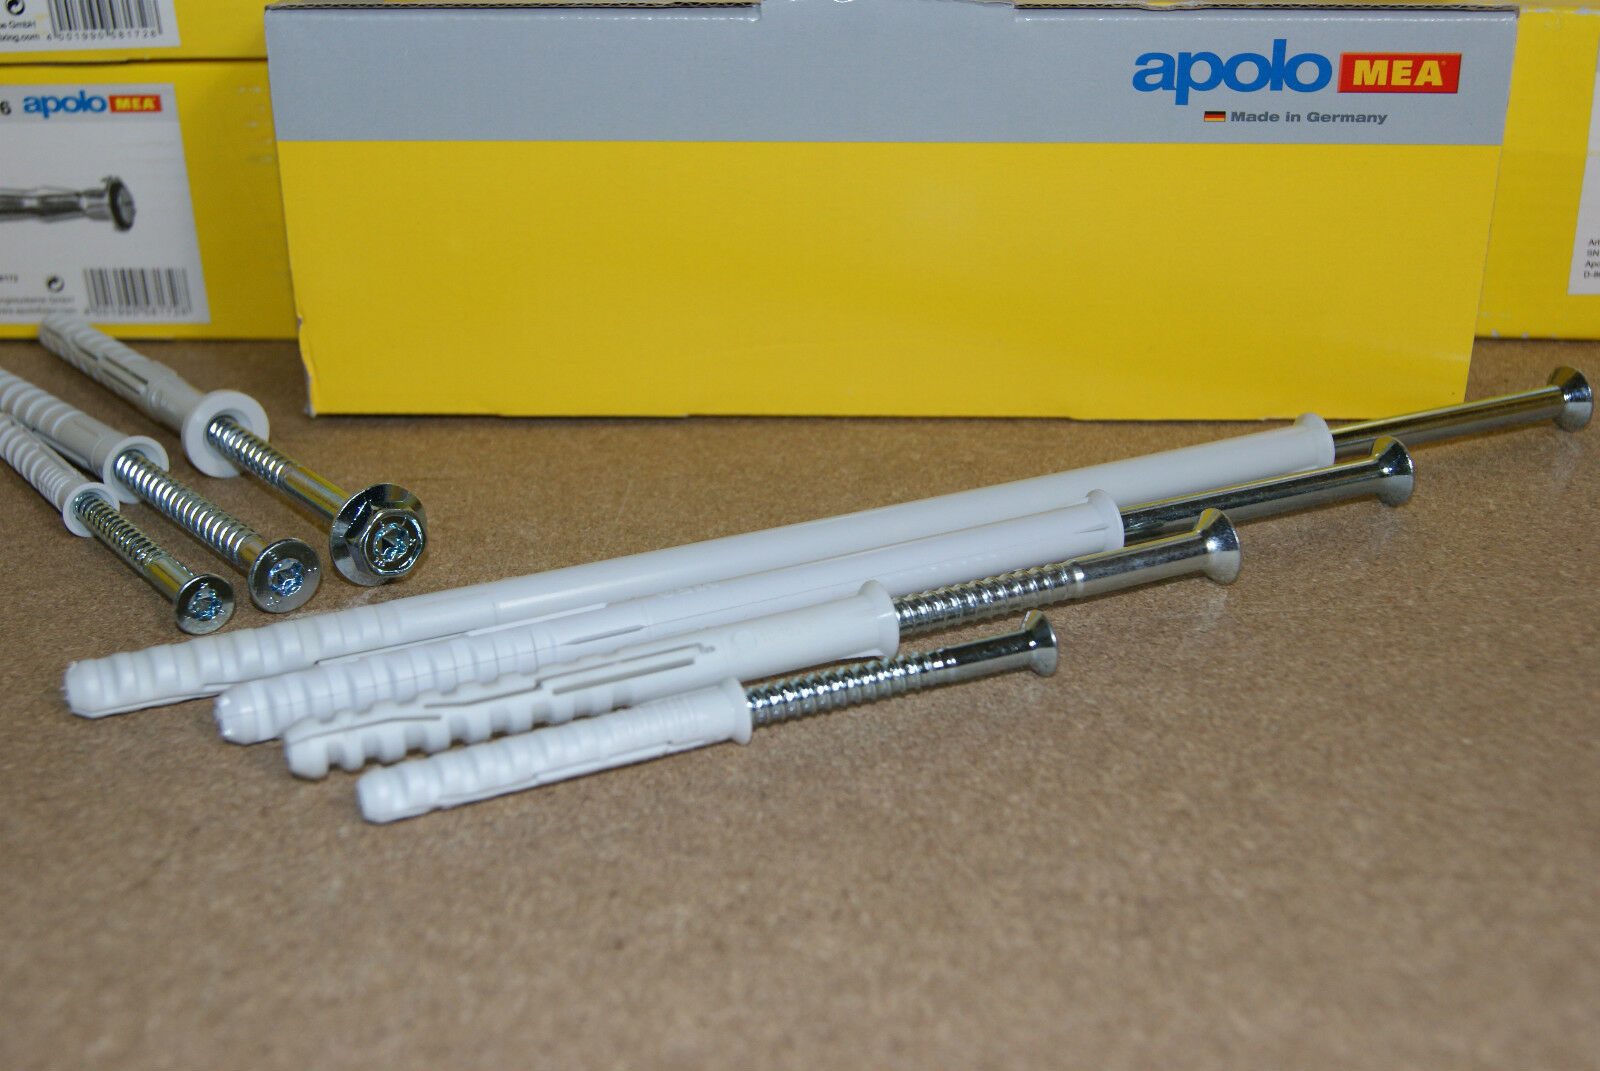 Apolo MEA Rahmendübel Dübel + Schraube R MFR HBR Fassadendübel Langschaftdübel